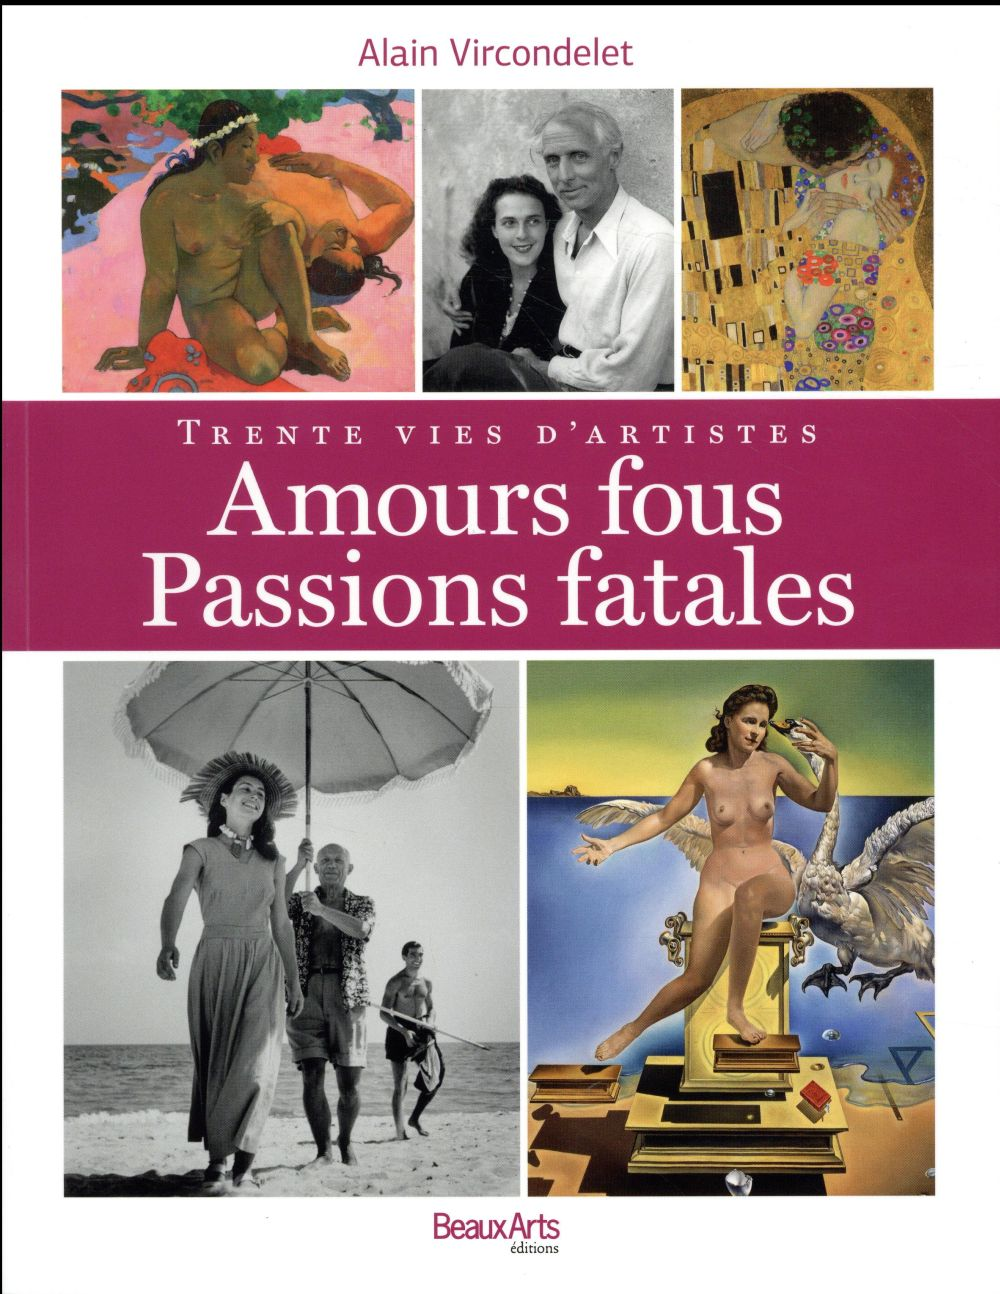 Amours fous, passions fatales ; trente vies d'artistes